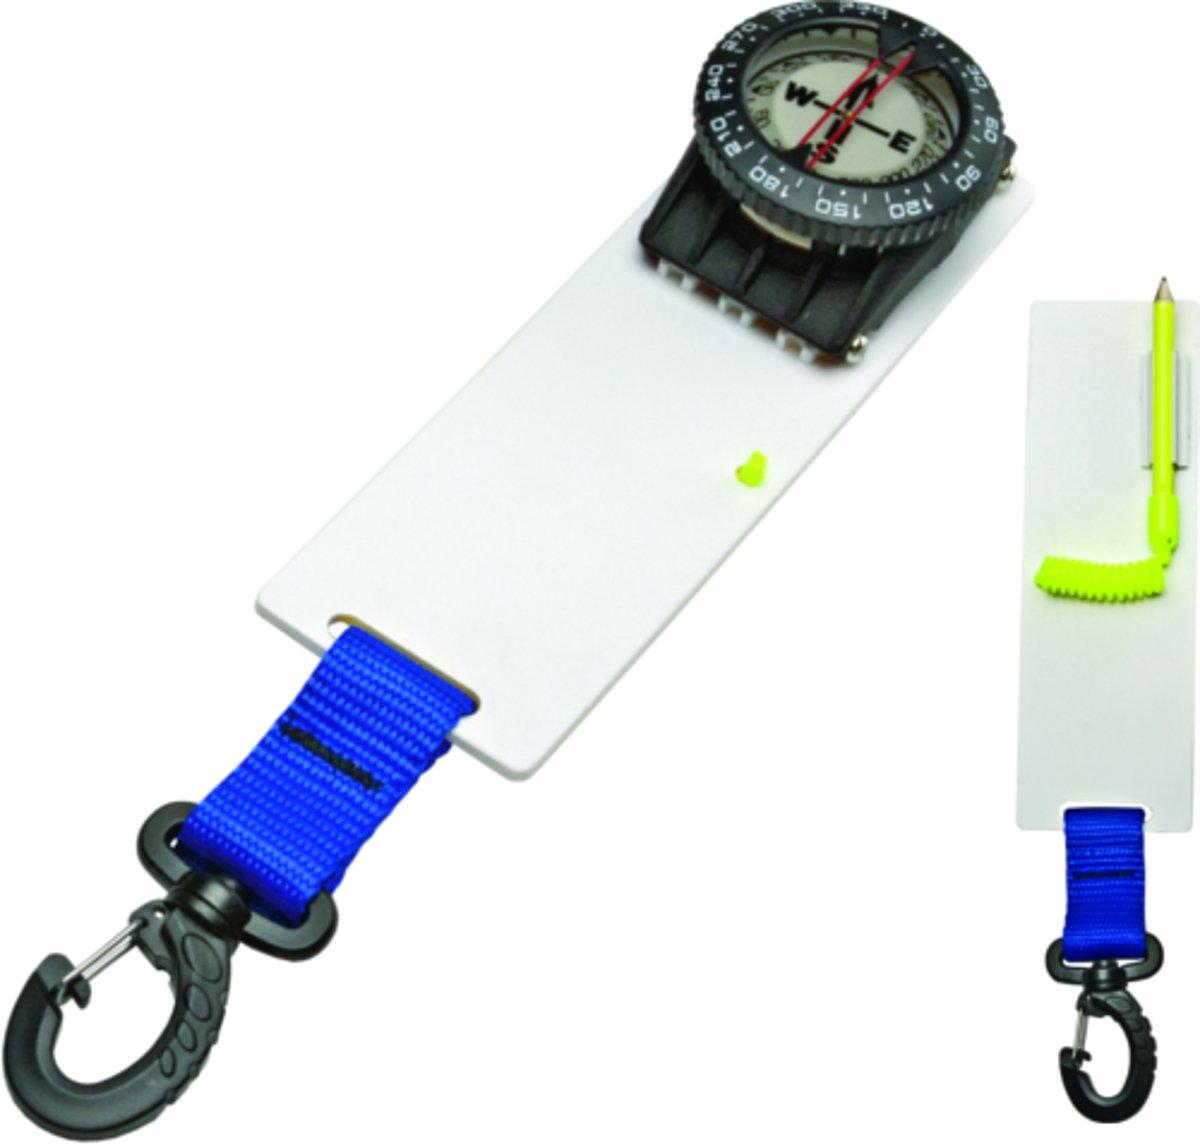 Innovative Scuba Diving Compass Slate with Clip (Black)